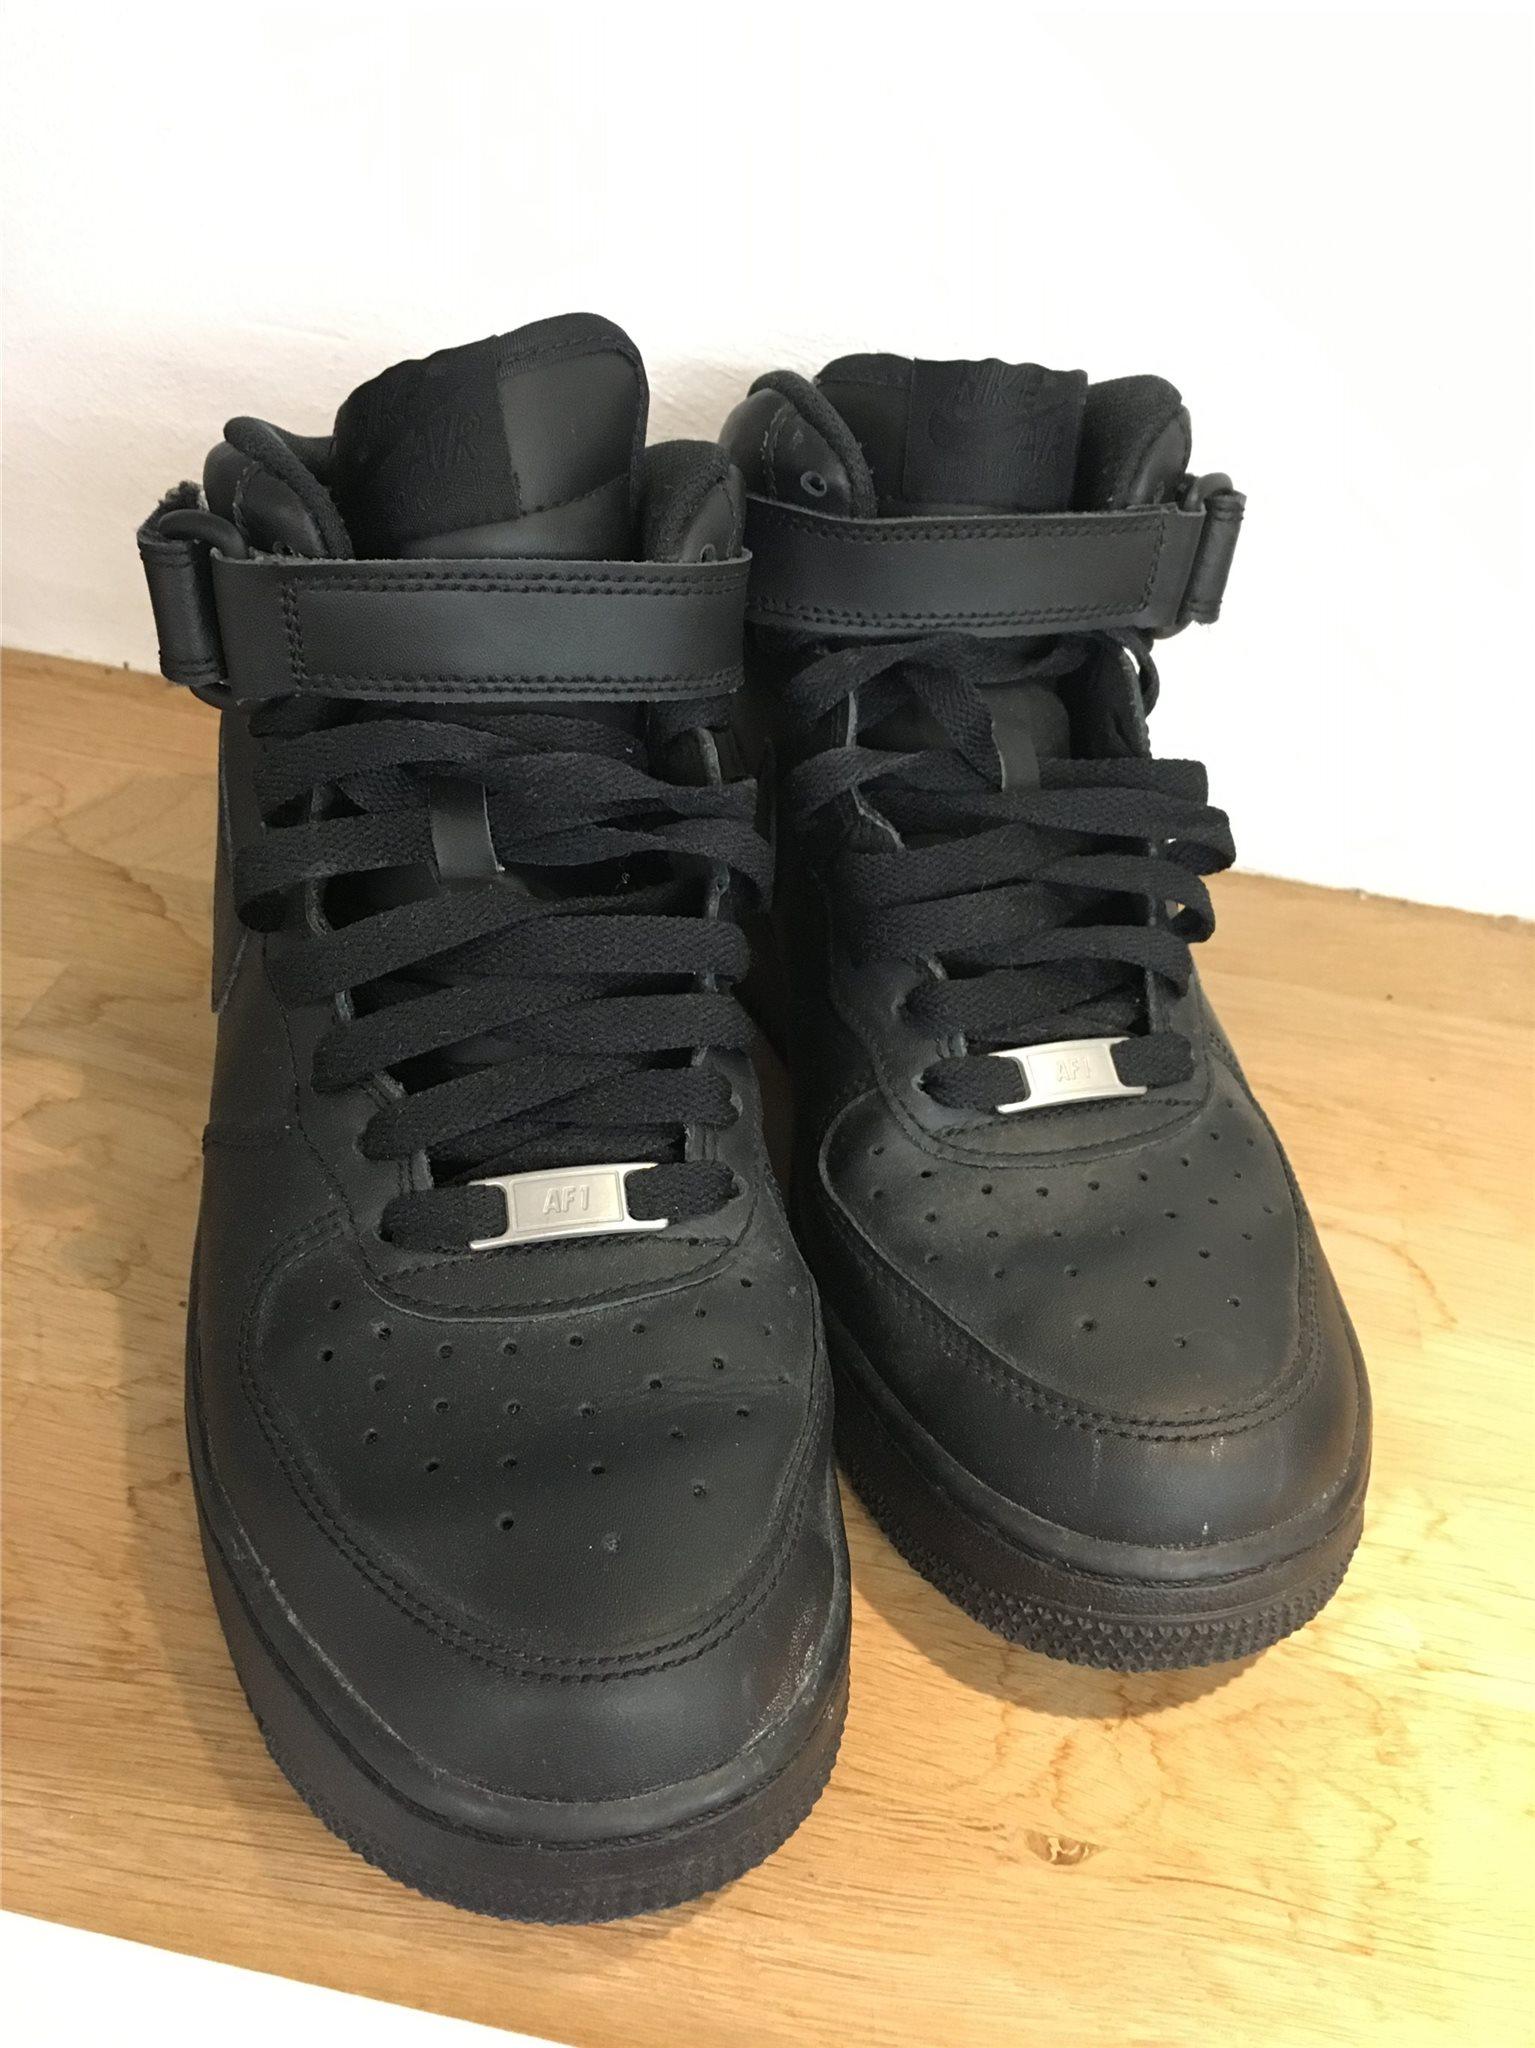 0d5a3b544cf ... 38-39 Vardag sneakers Skor ... the latest 368c3 cc9bc Nike Air Max Skor  Storlek 38